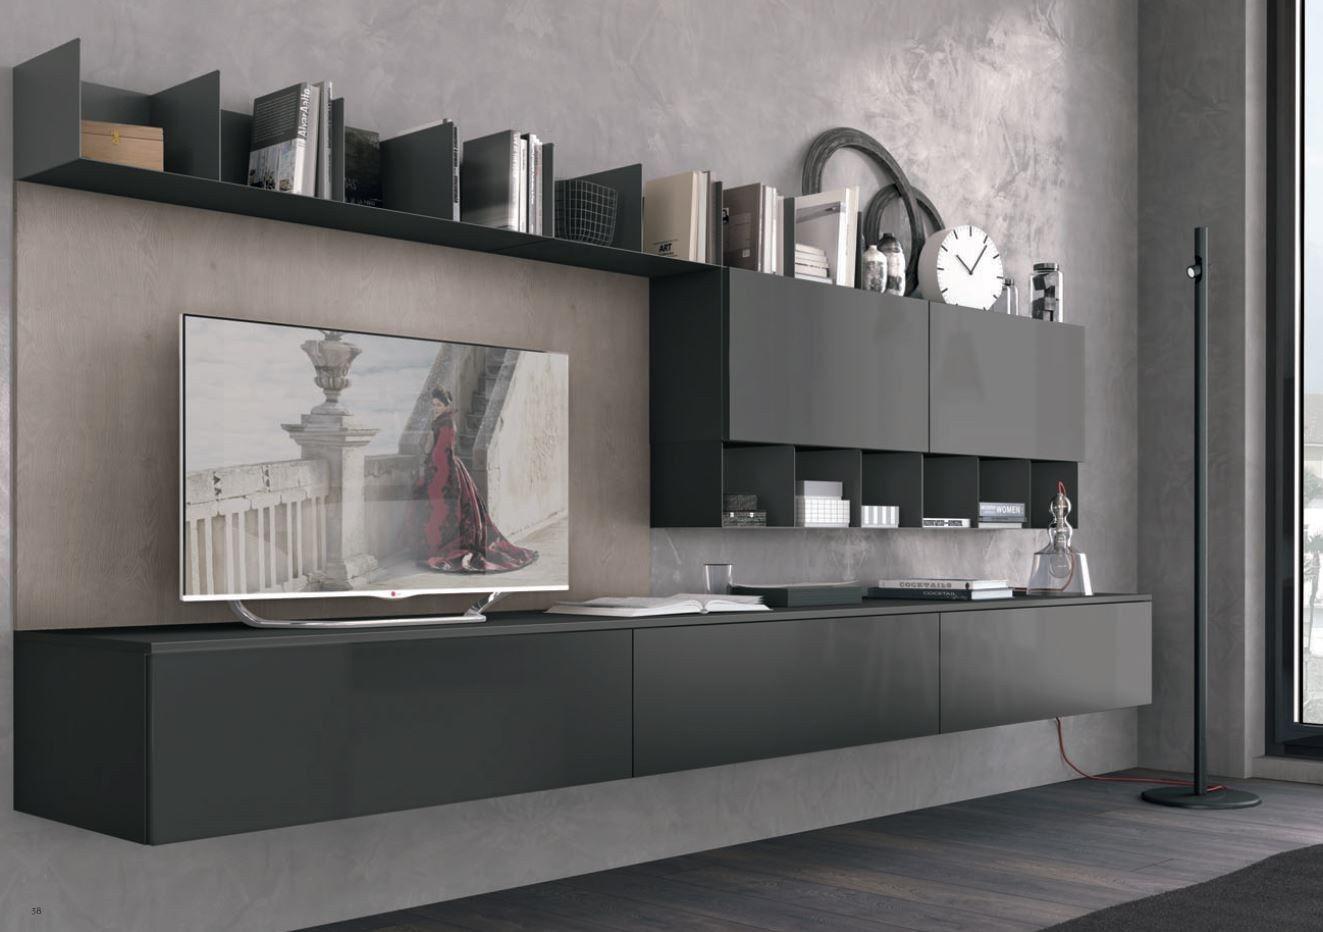 Best componenti cucine componibili gallery ideas - Componibili per cucina ...